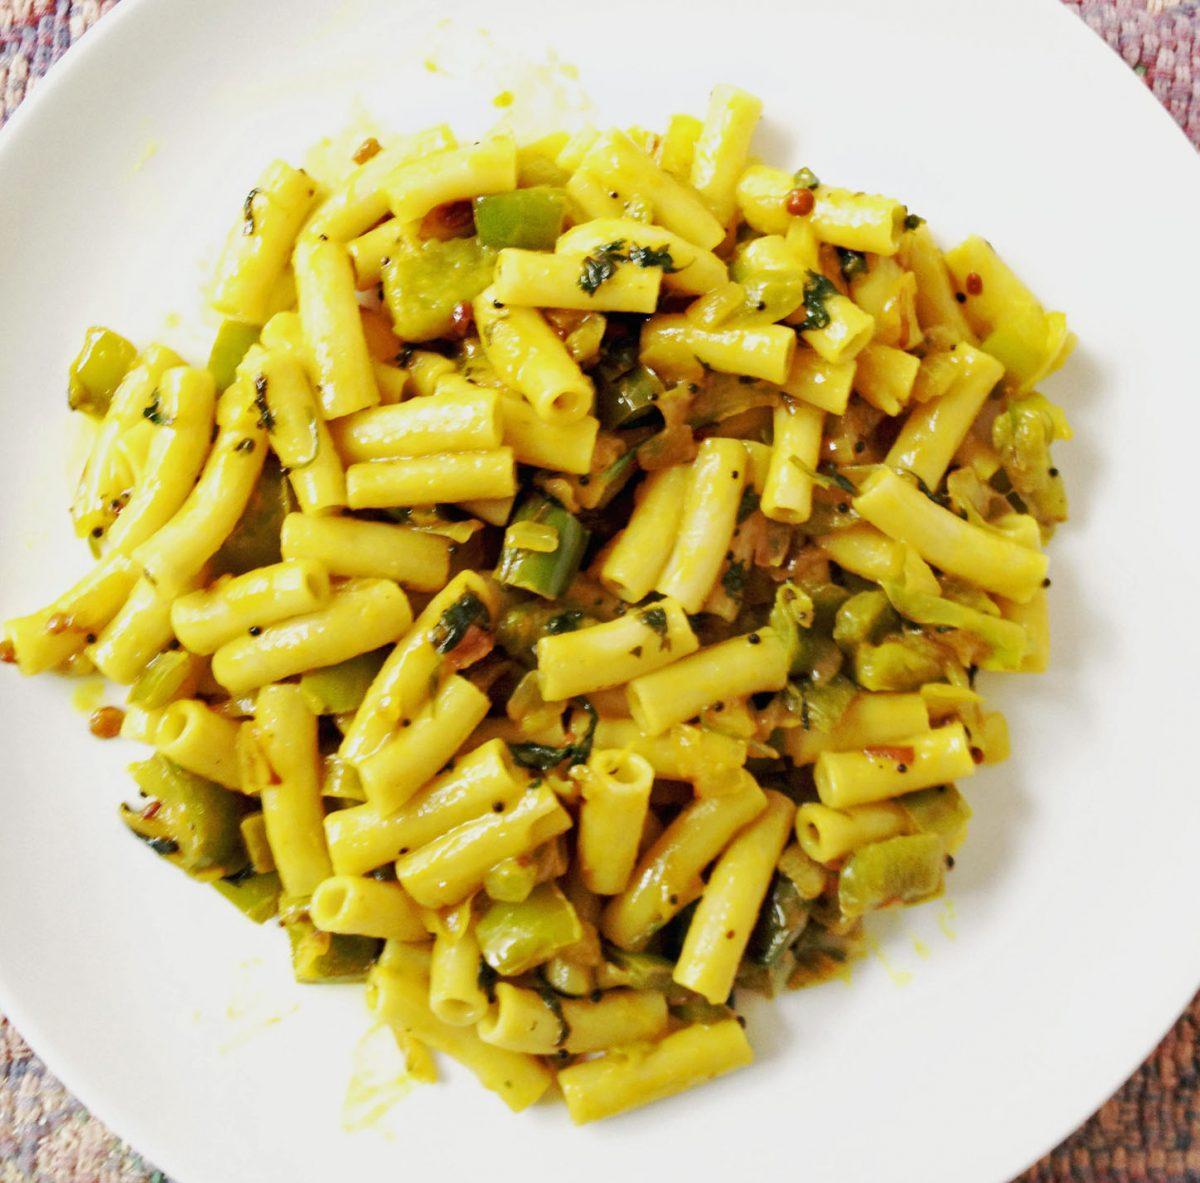 Brown Rice Pasta with Veggies